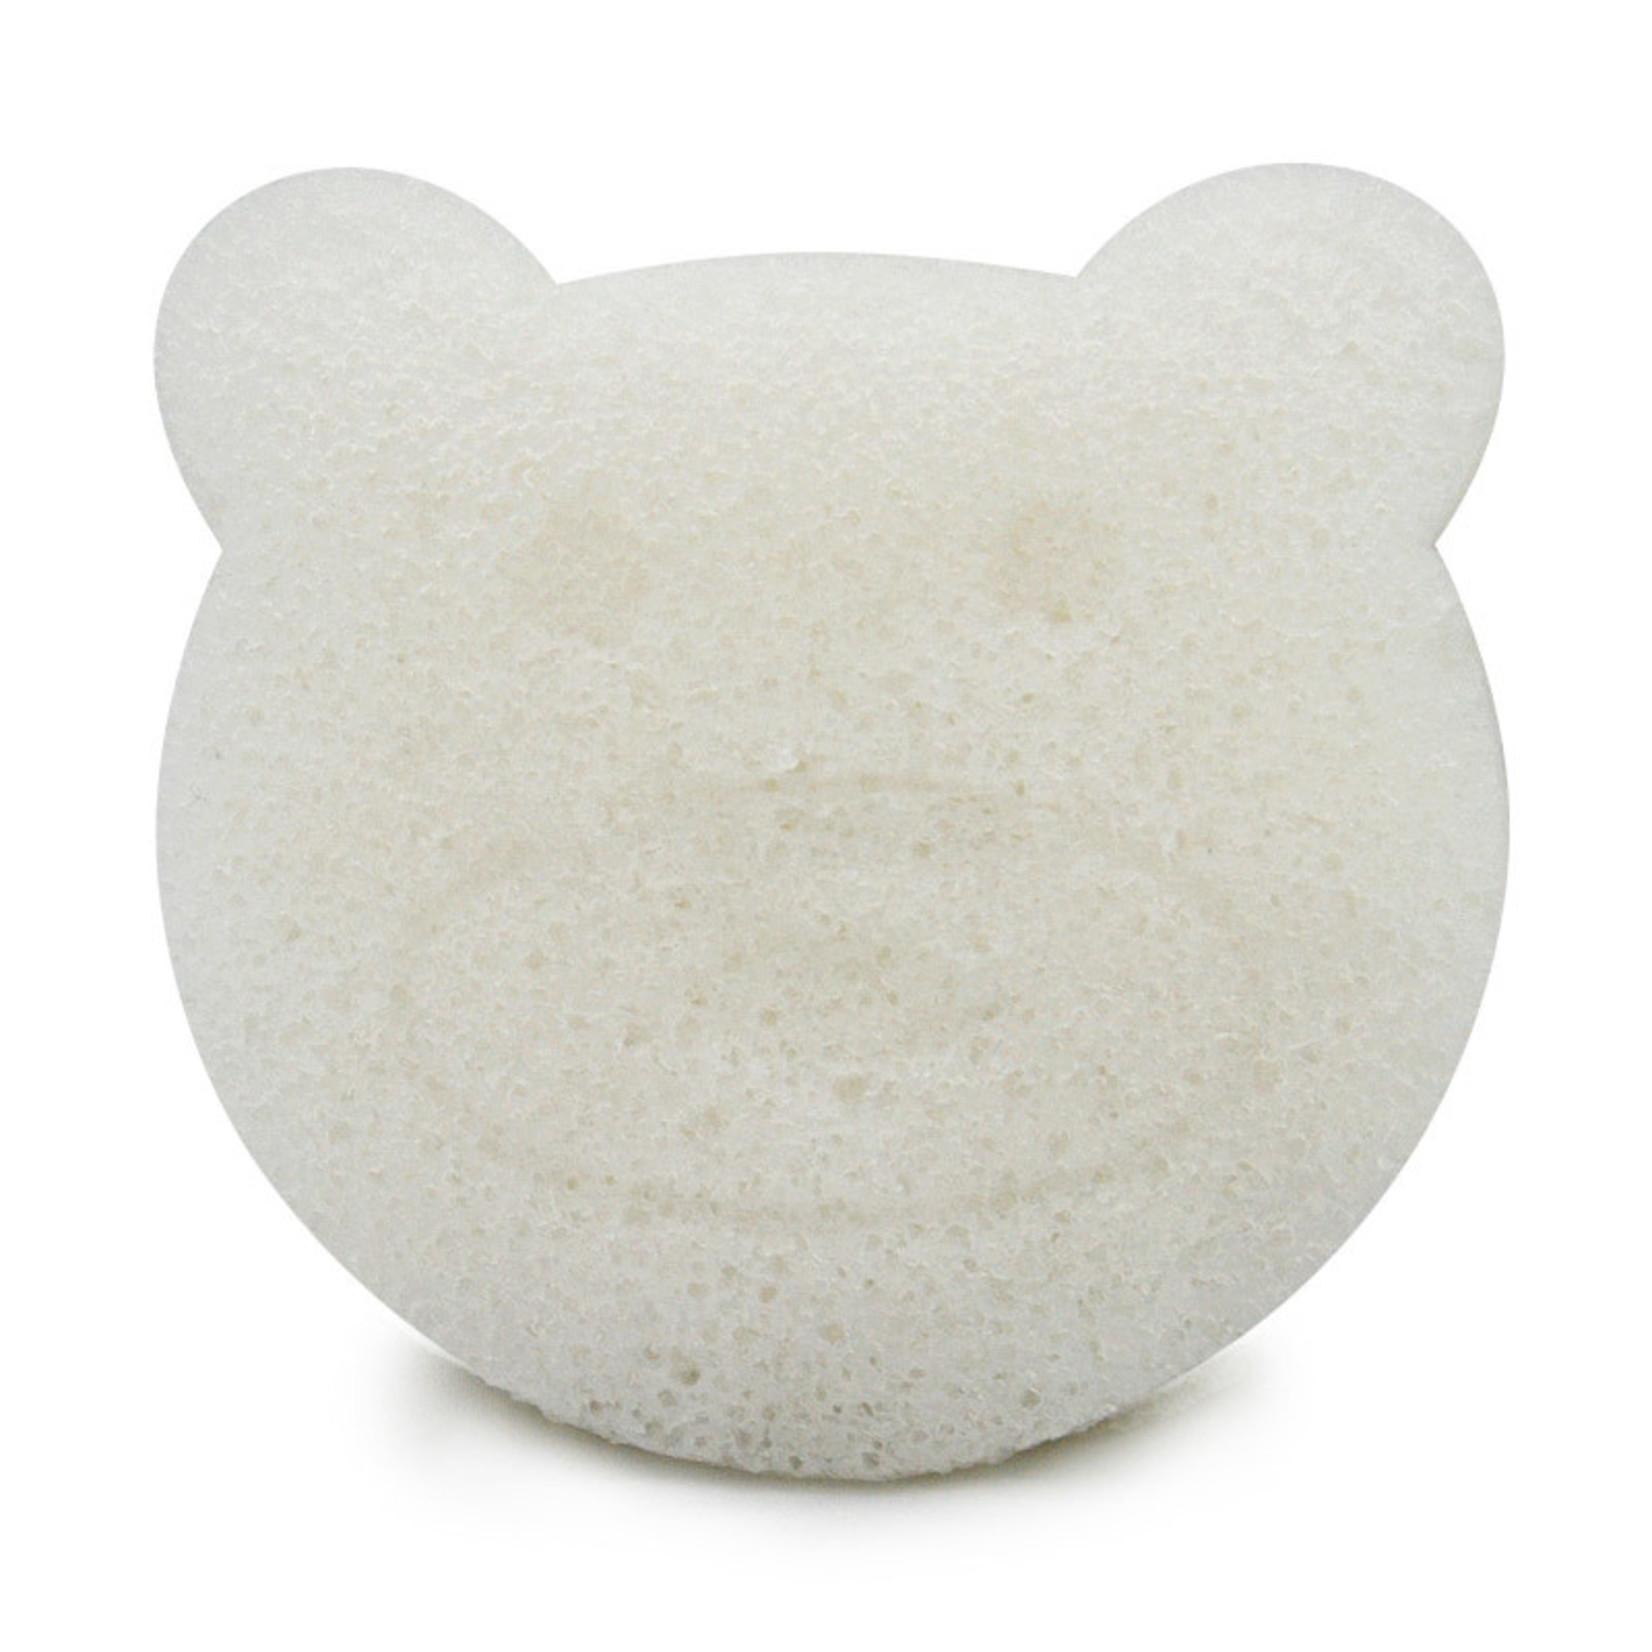 Eco Revolution Konjac Sponge Facial Pure